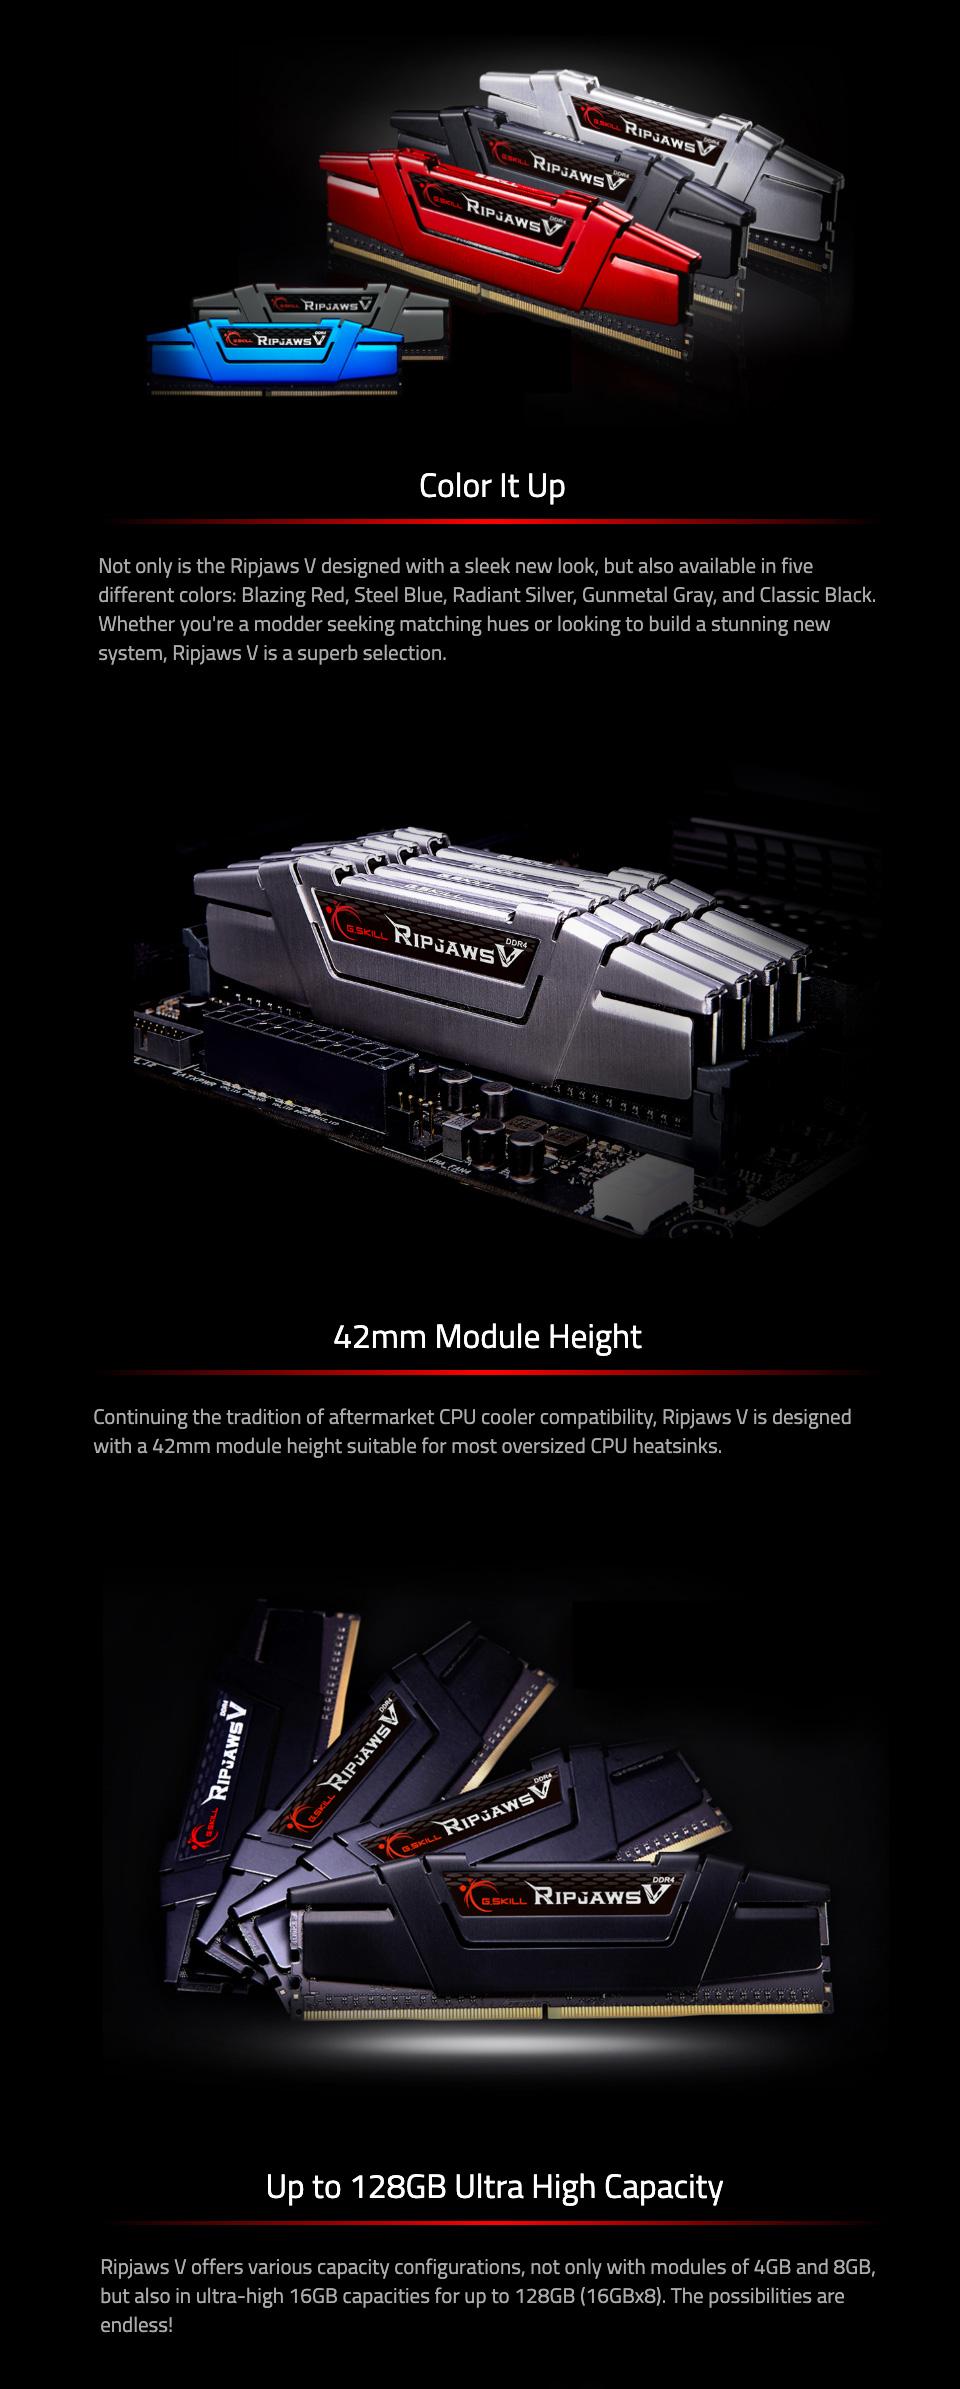 G.Skill Ripjaws V F4-3600C18D-32GVK 32GB (2x16GB) DDR4 features 2